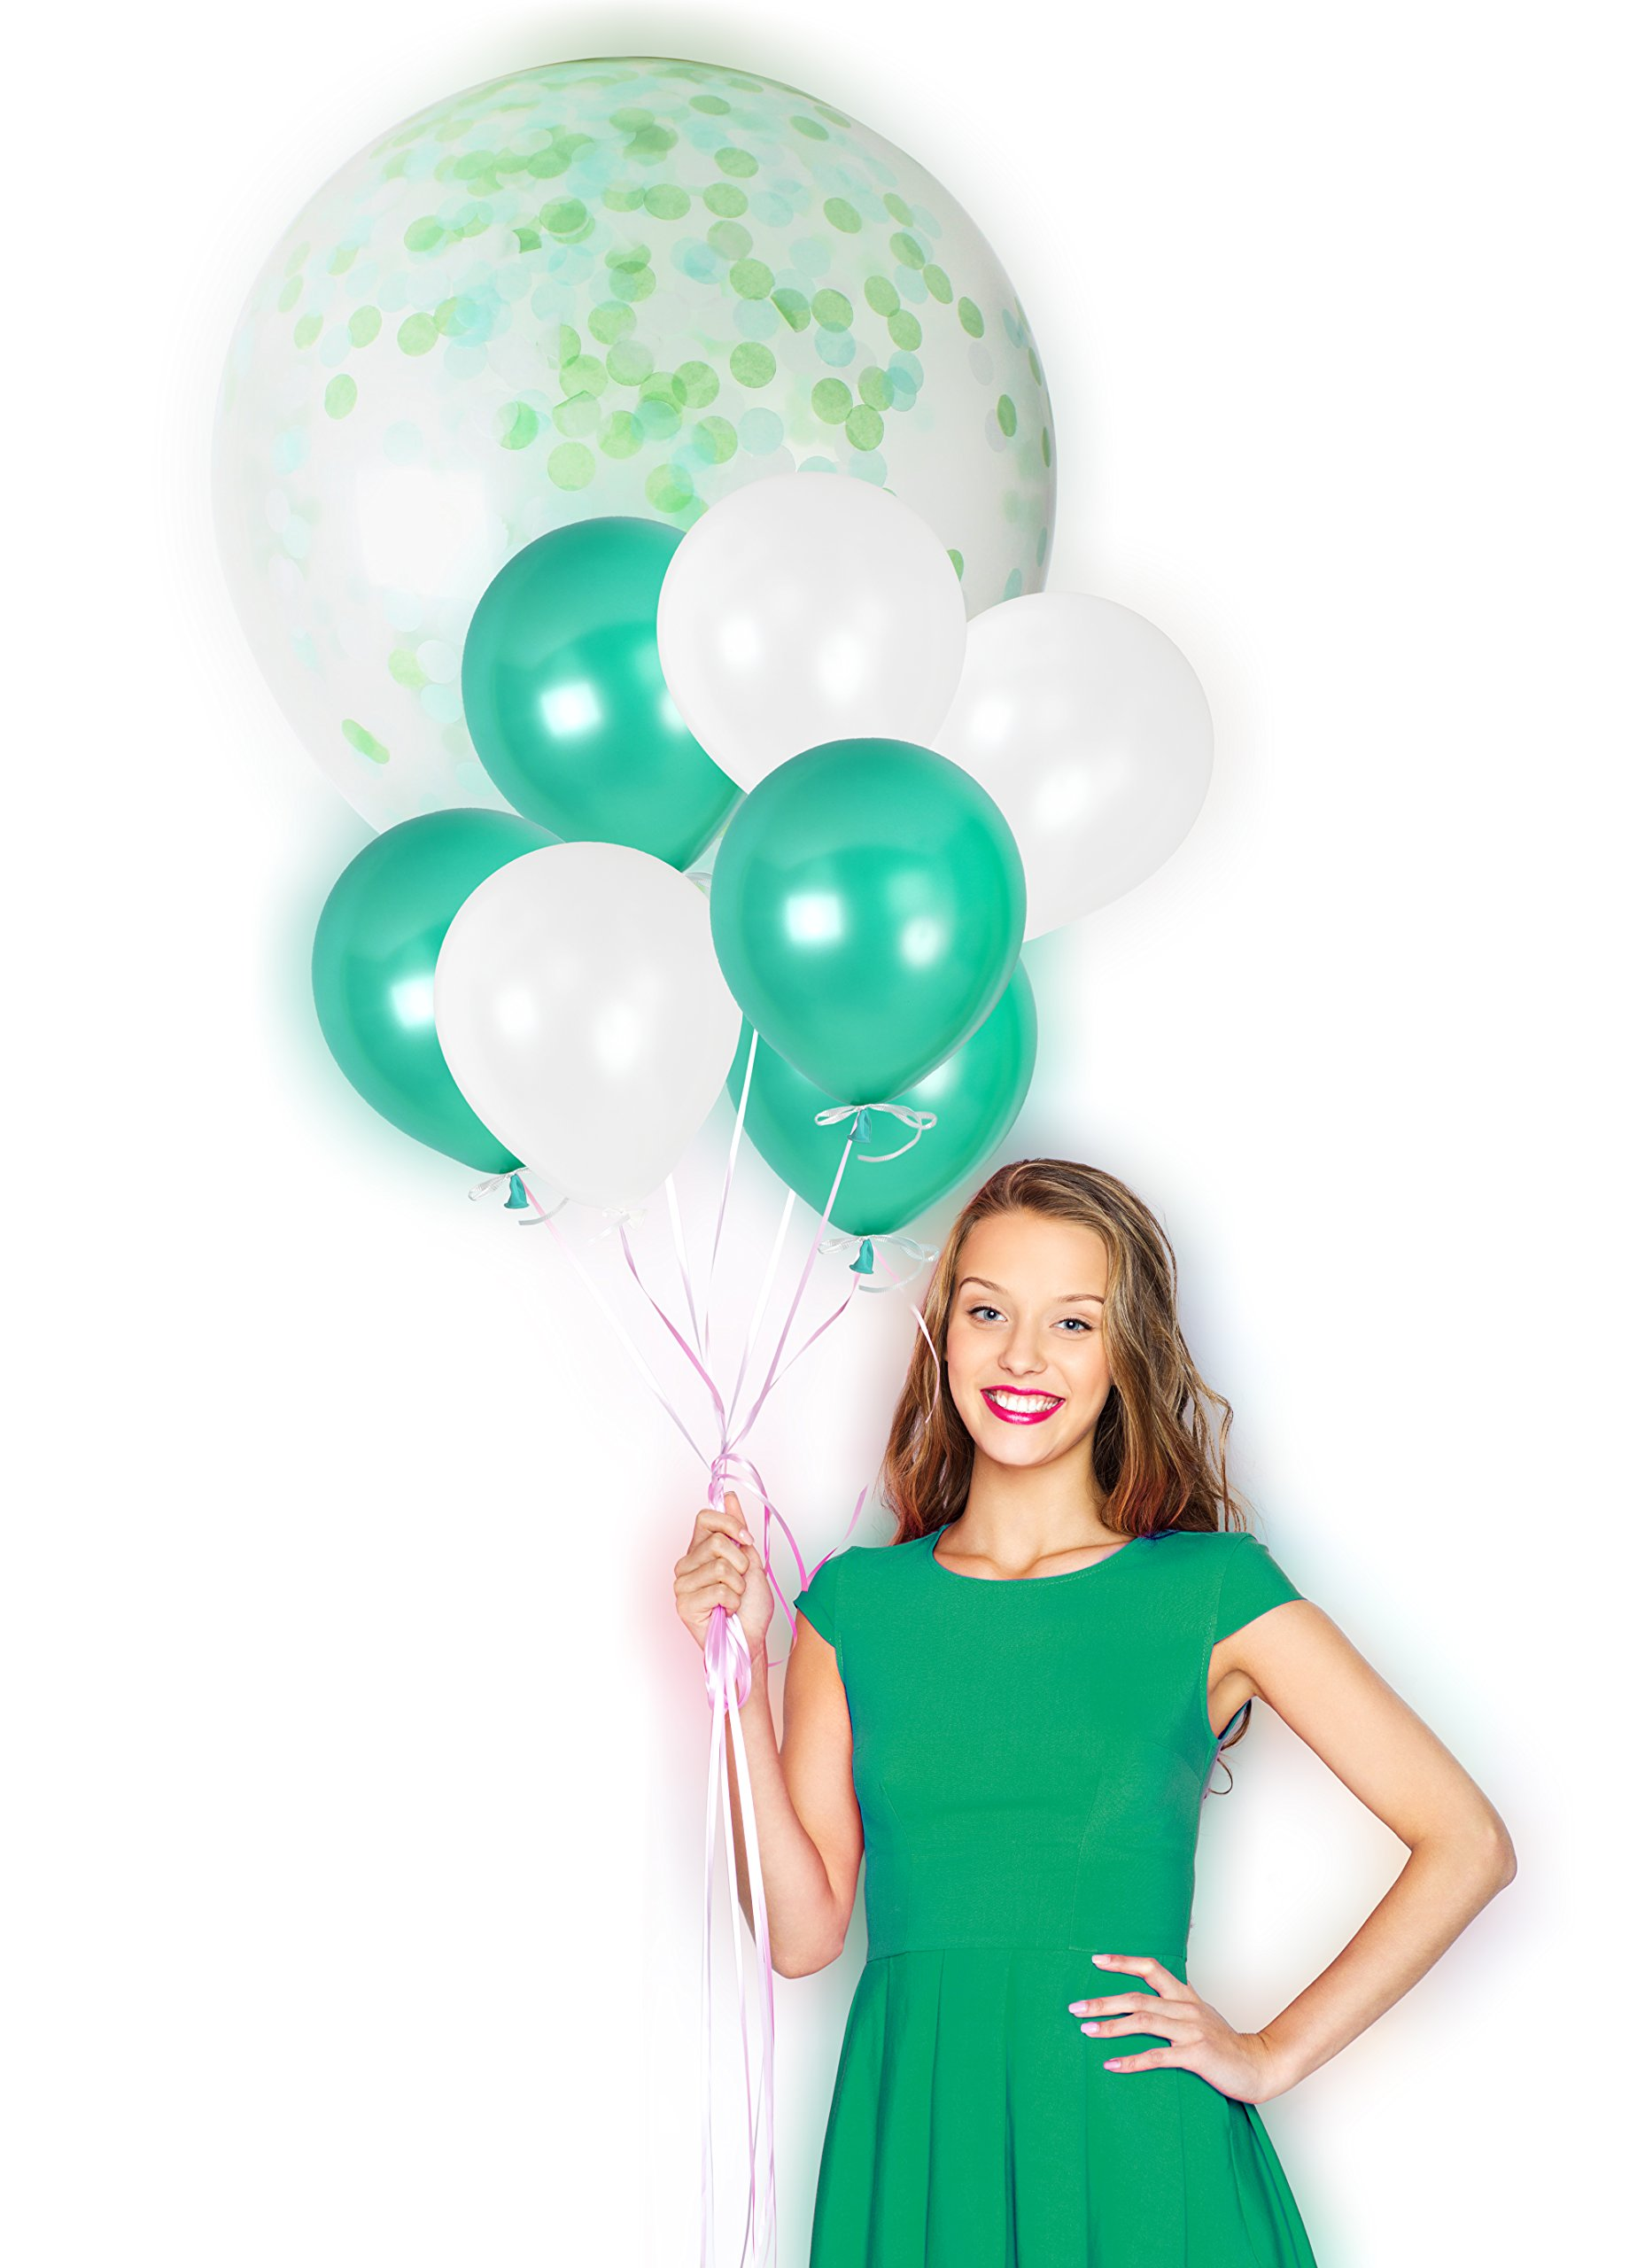 Green and White Birthday Metallic Helium Pearlized Latex Balloons Transparent Confetti Decorations for Jungle St Patrick Emerald Wedding Dinosaur Theme Backdrop